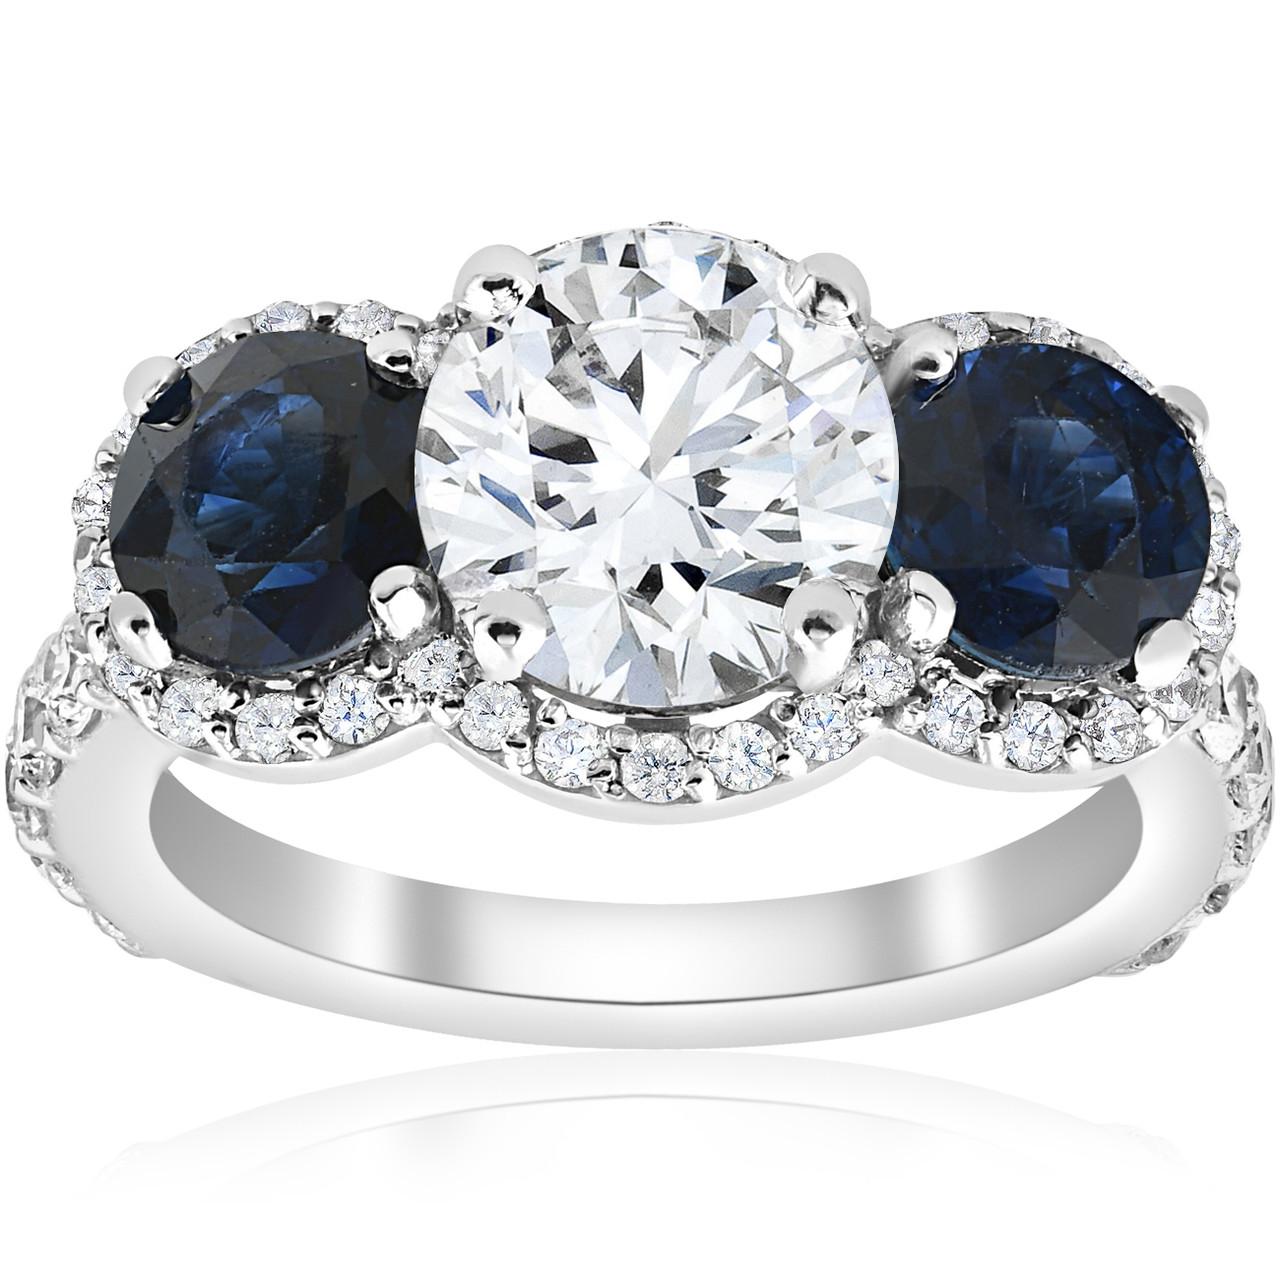 3.45 Round Cut 3-Stone Engagement Wedding Bridal Anniversary Ring 14k White Gold